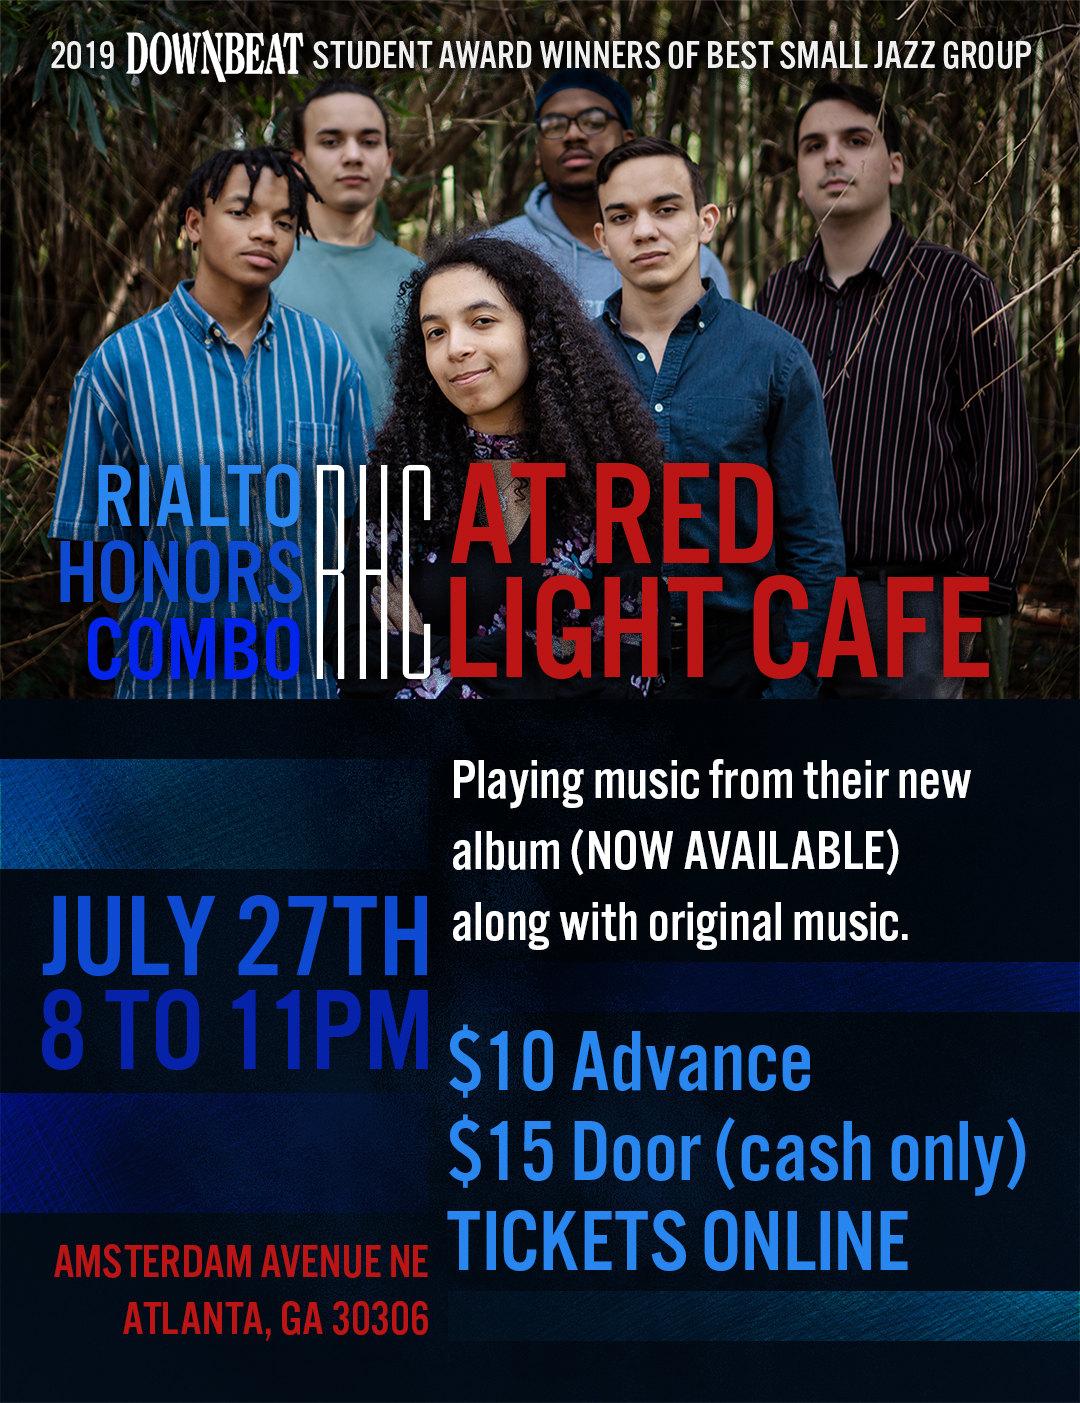 Rialto Youth Jazz Orchestra Honors Combo: Celebrating the Music of Roy Hargrove — July 27, 2019 — Red Light Café, Atlanta, GA